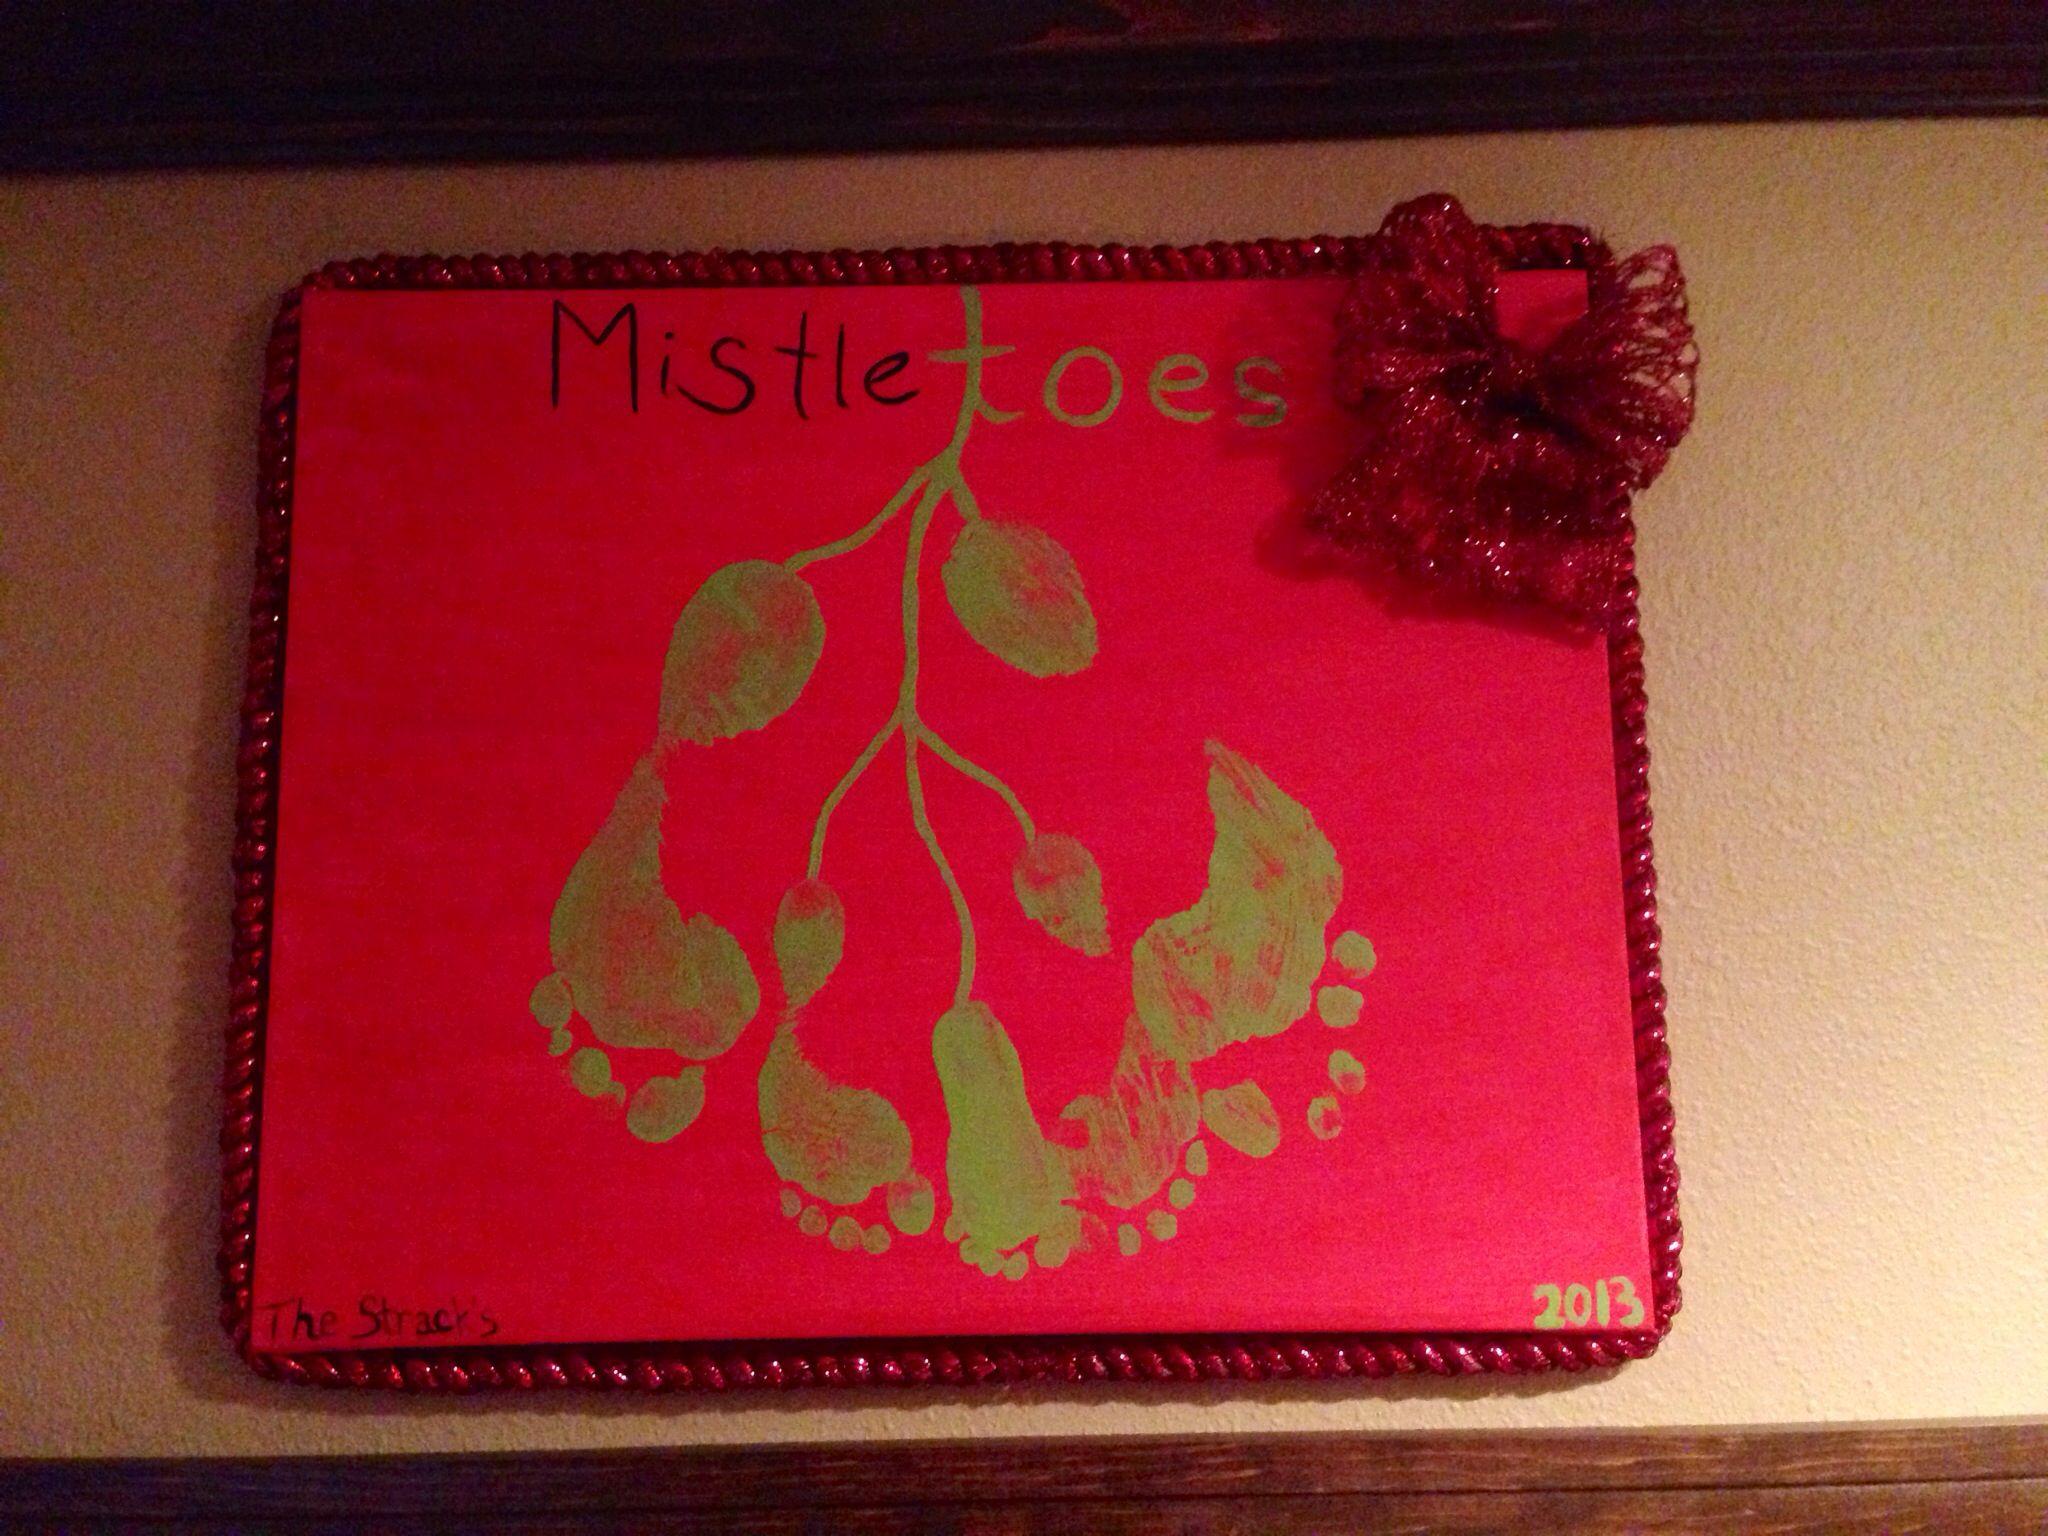 Mistletoes footprints #mistletoesfootprintcraft